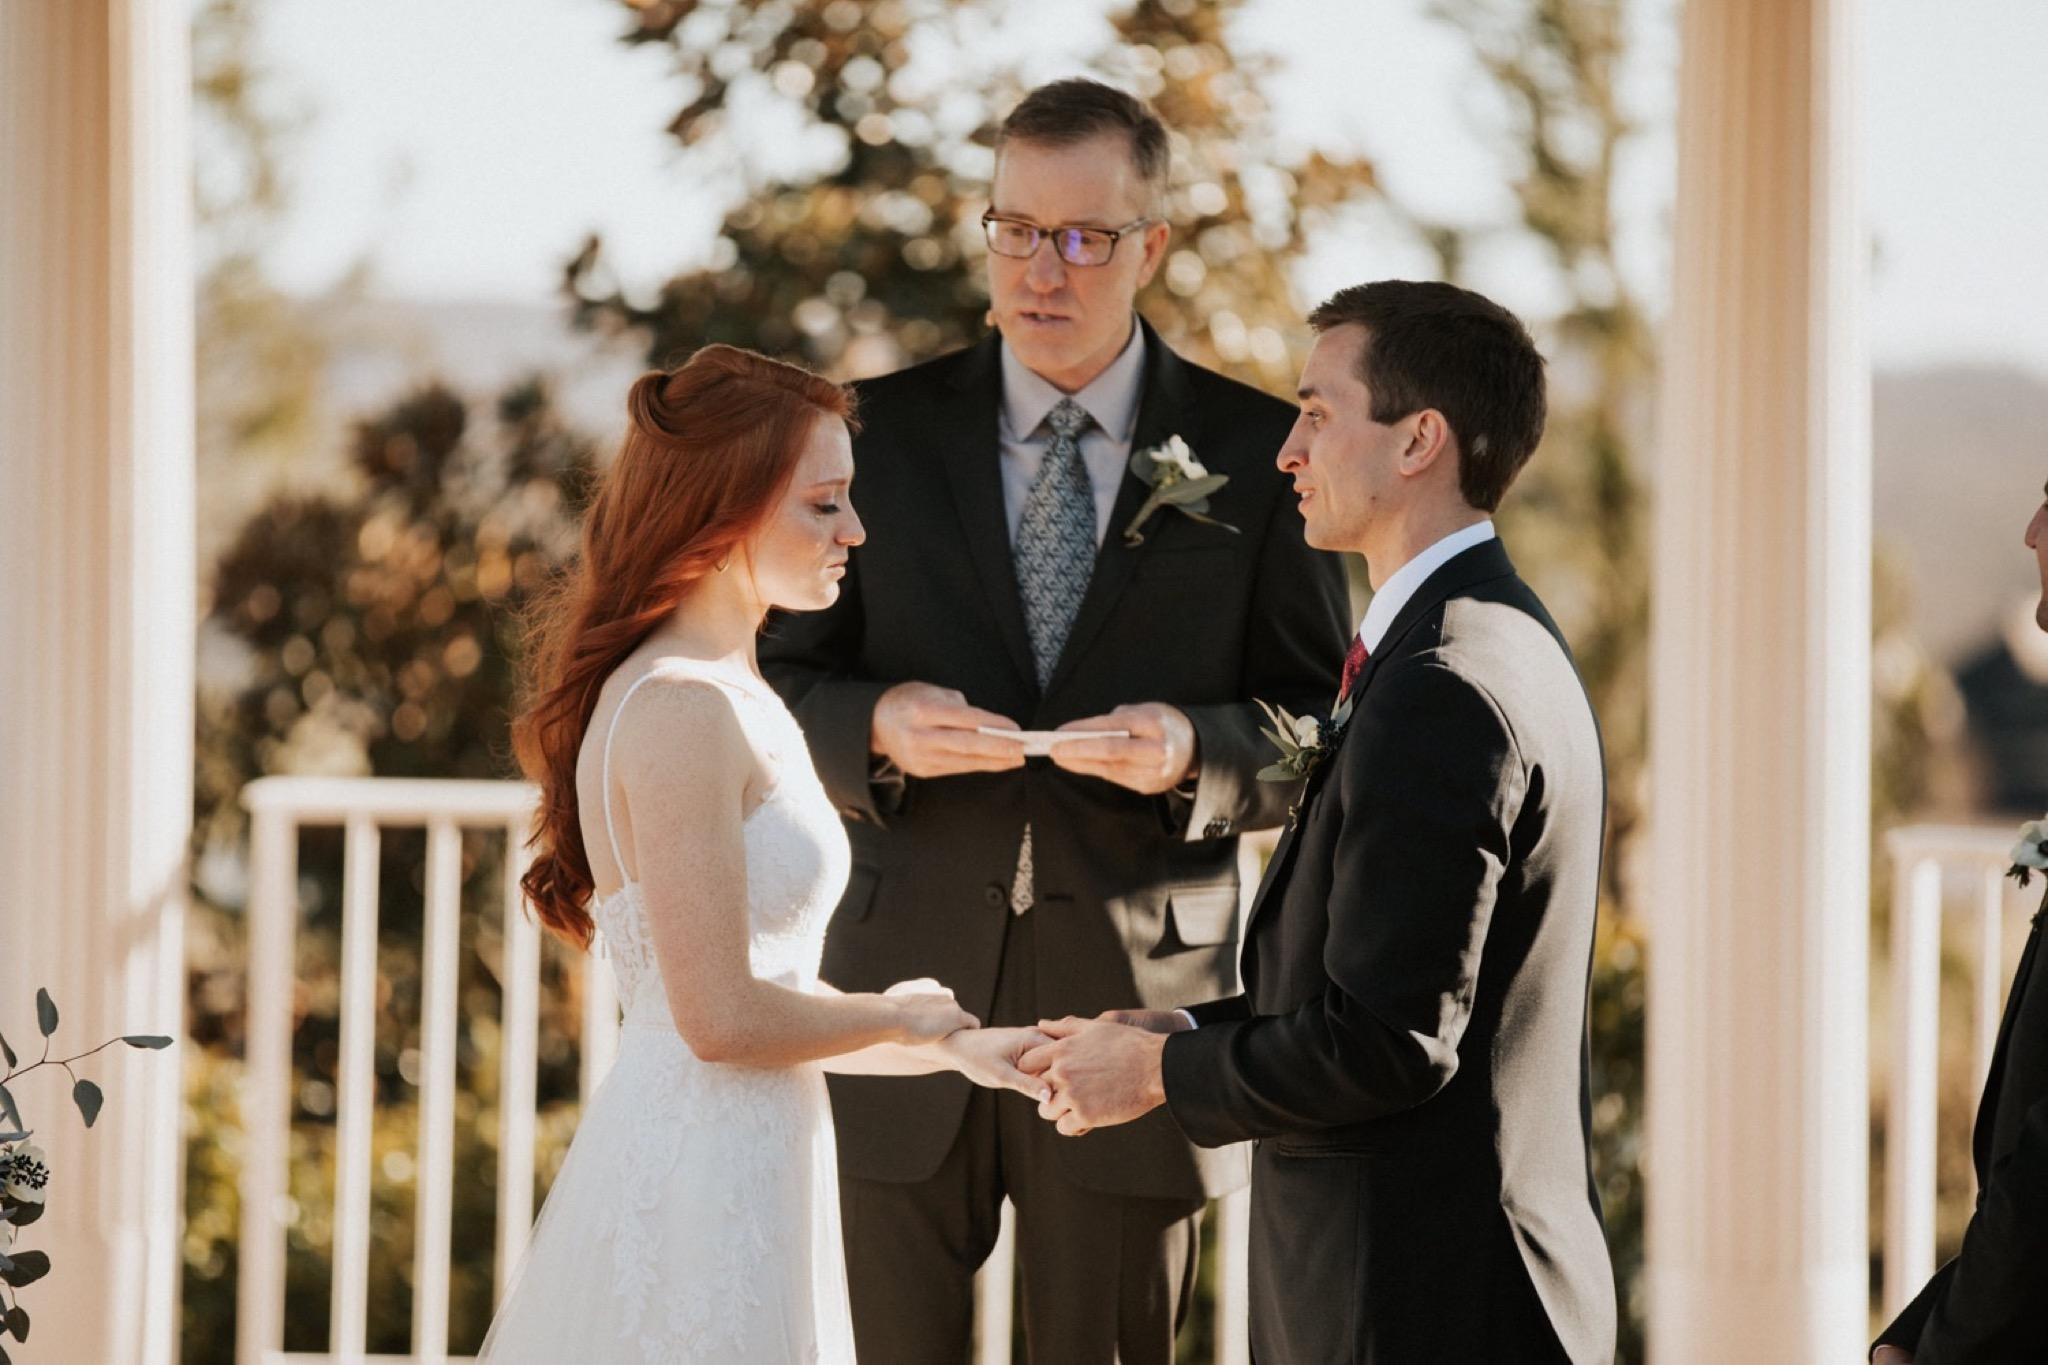 50_West Manor Estate Weddings - Pat Cori Photography-104_Ceremony_VirginiaWeddingPhotographer_PatCoriPhotography_WestManorEstate_Wedding.jpg